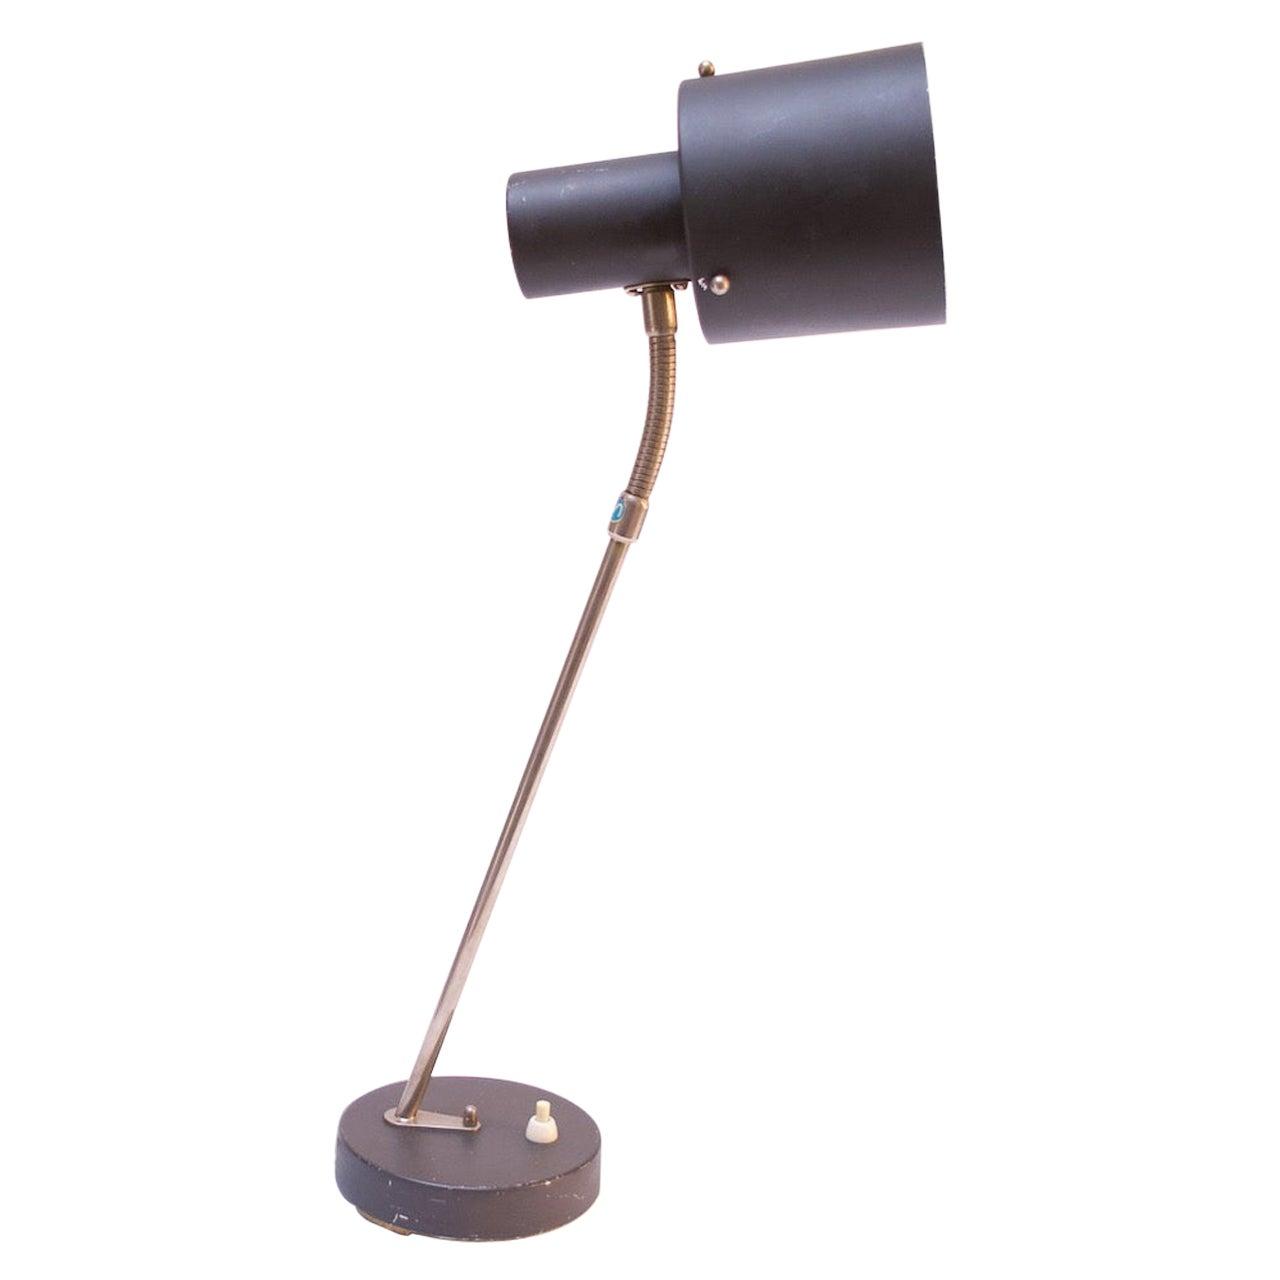 Midcentury Swedish Modern Gooseneck Table Lamp by Ewå Värnamo